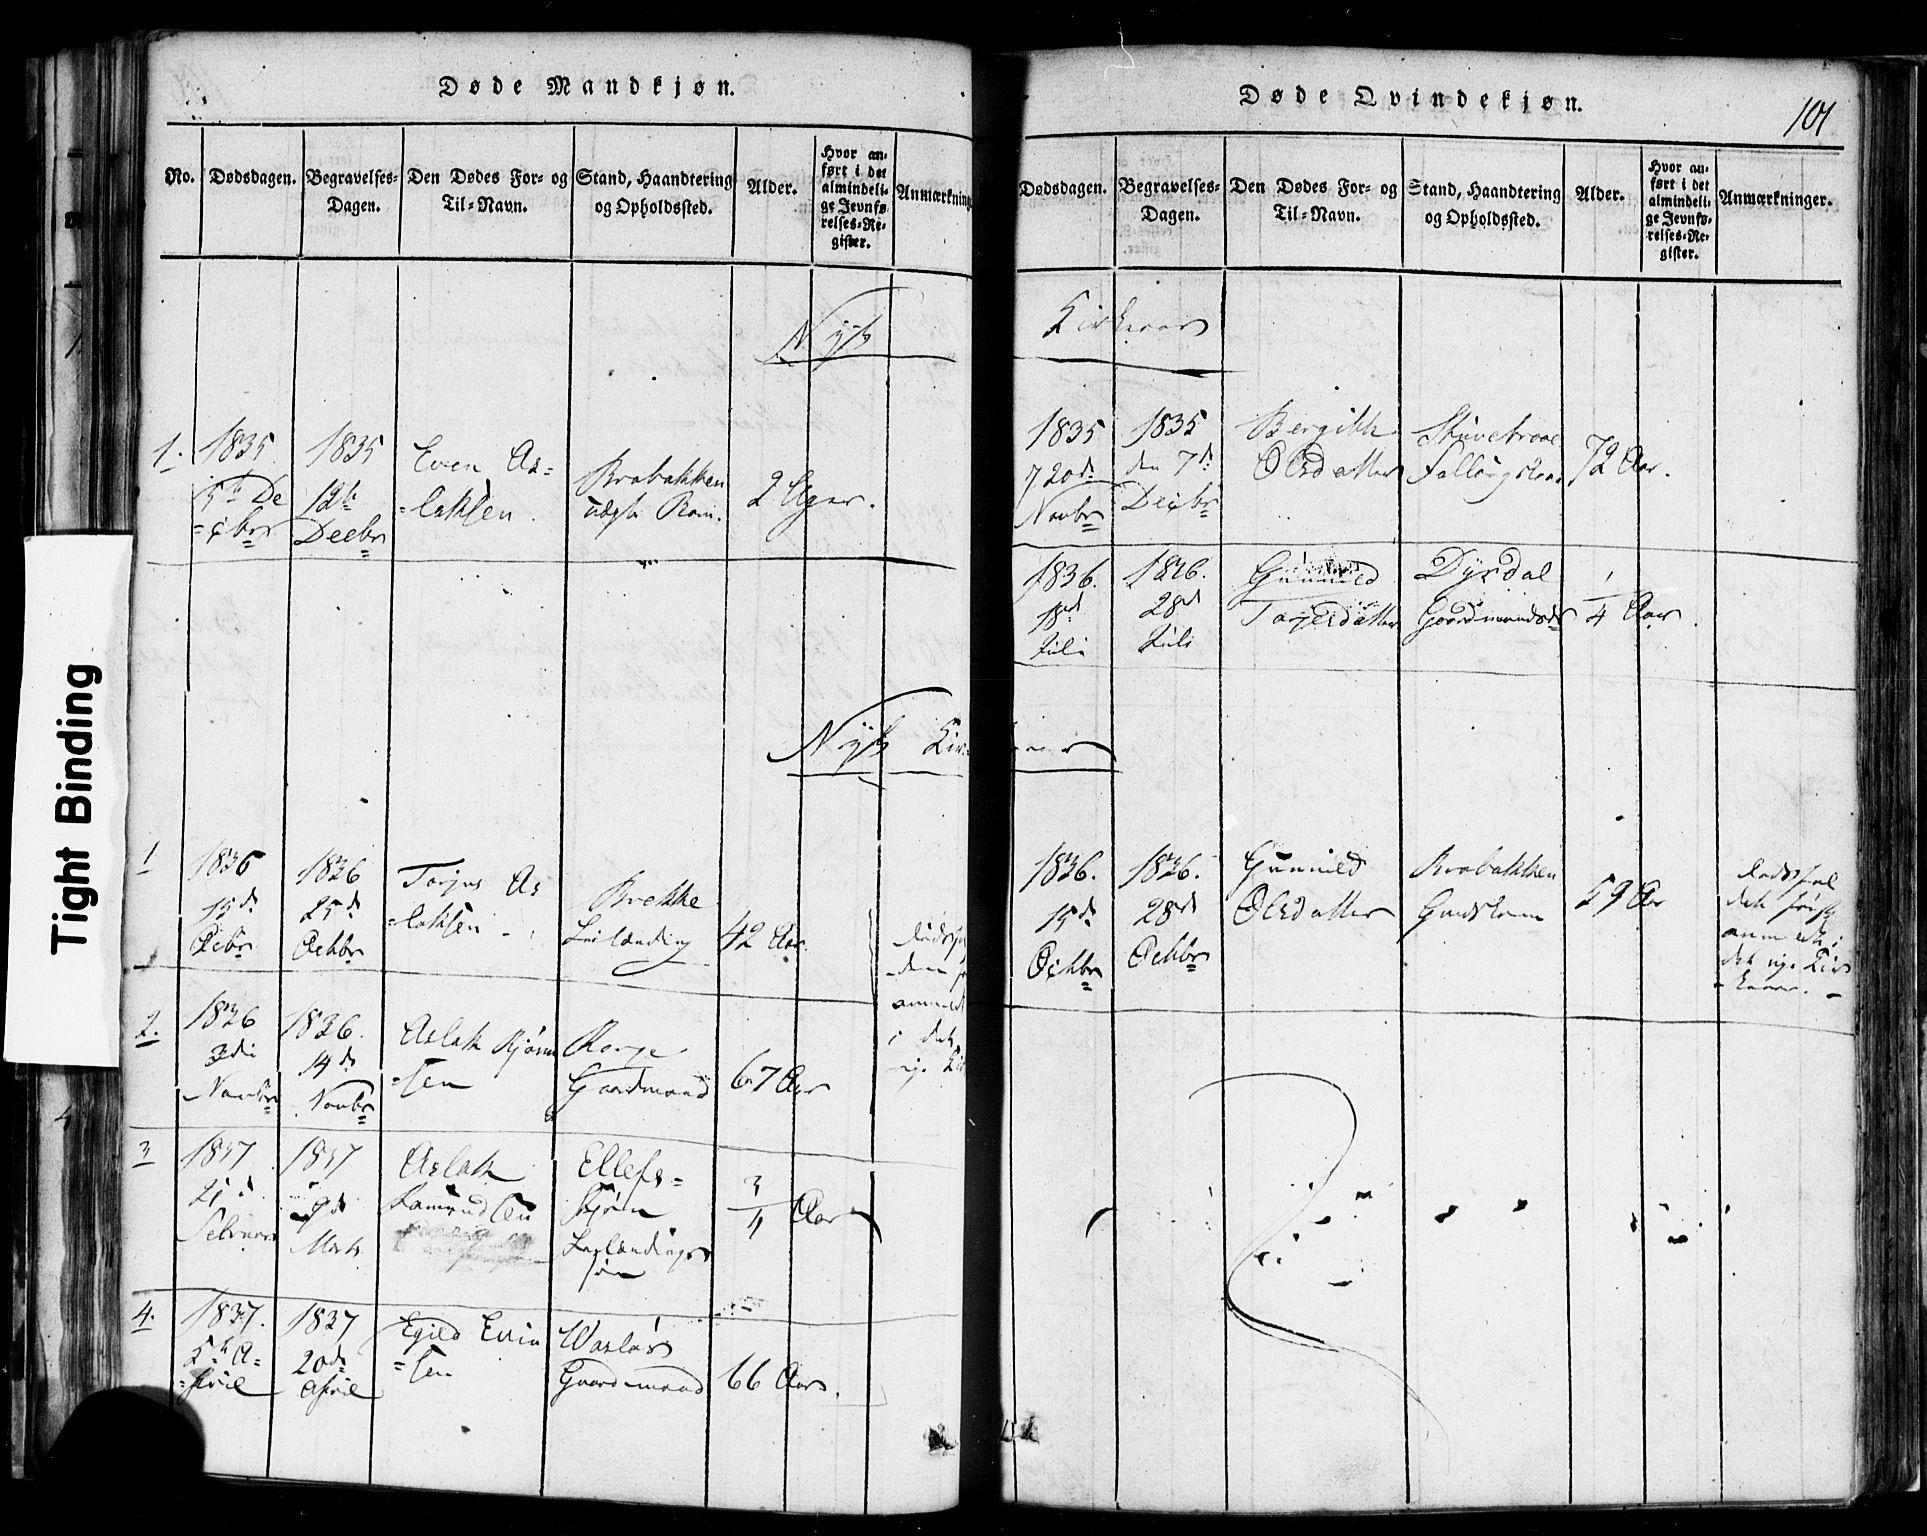 SAKO, Rauland kirkebøker, F/Fa/L0002: Ministerialbok nr. 2, 1815-1860, s. 101